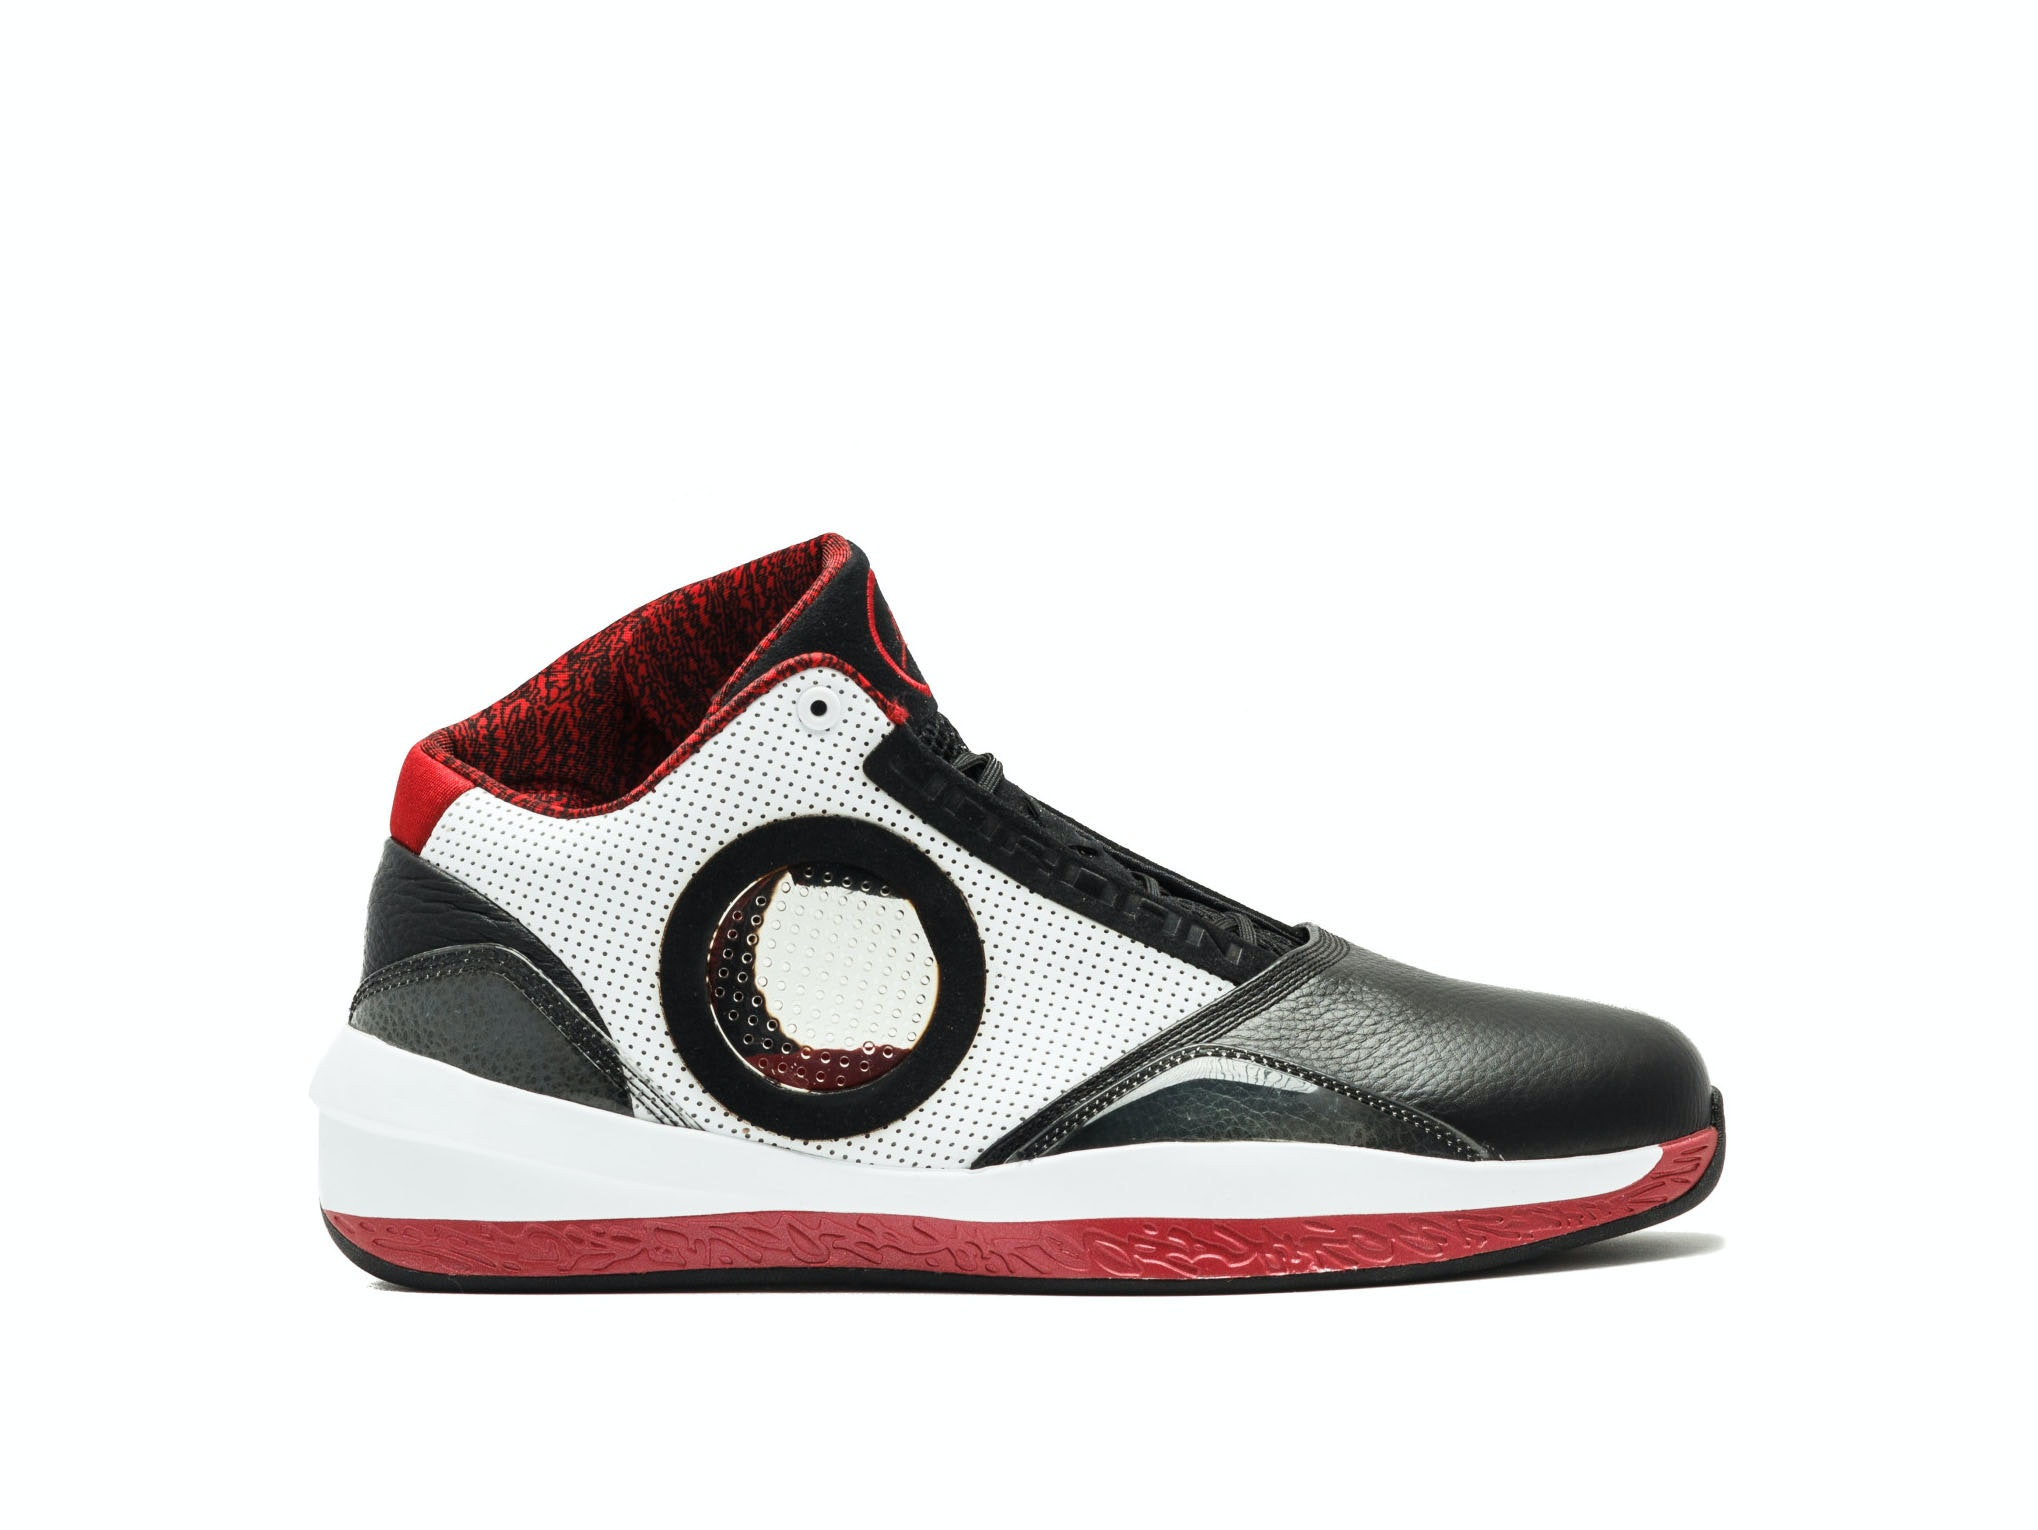 56a0a987c78 Shop Air Jordan 2010 Black Varsity Red Online | Laced